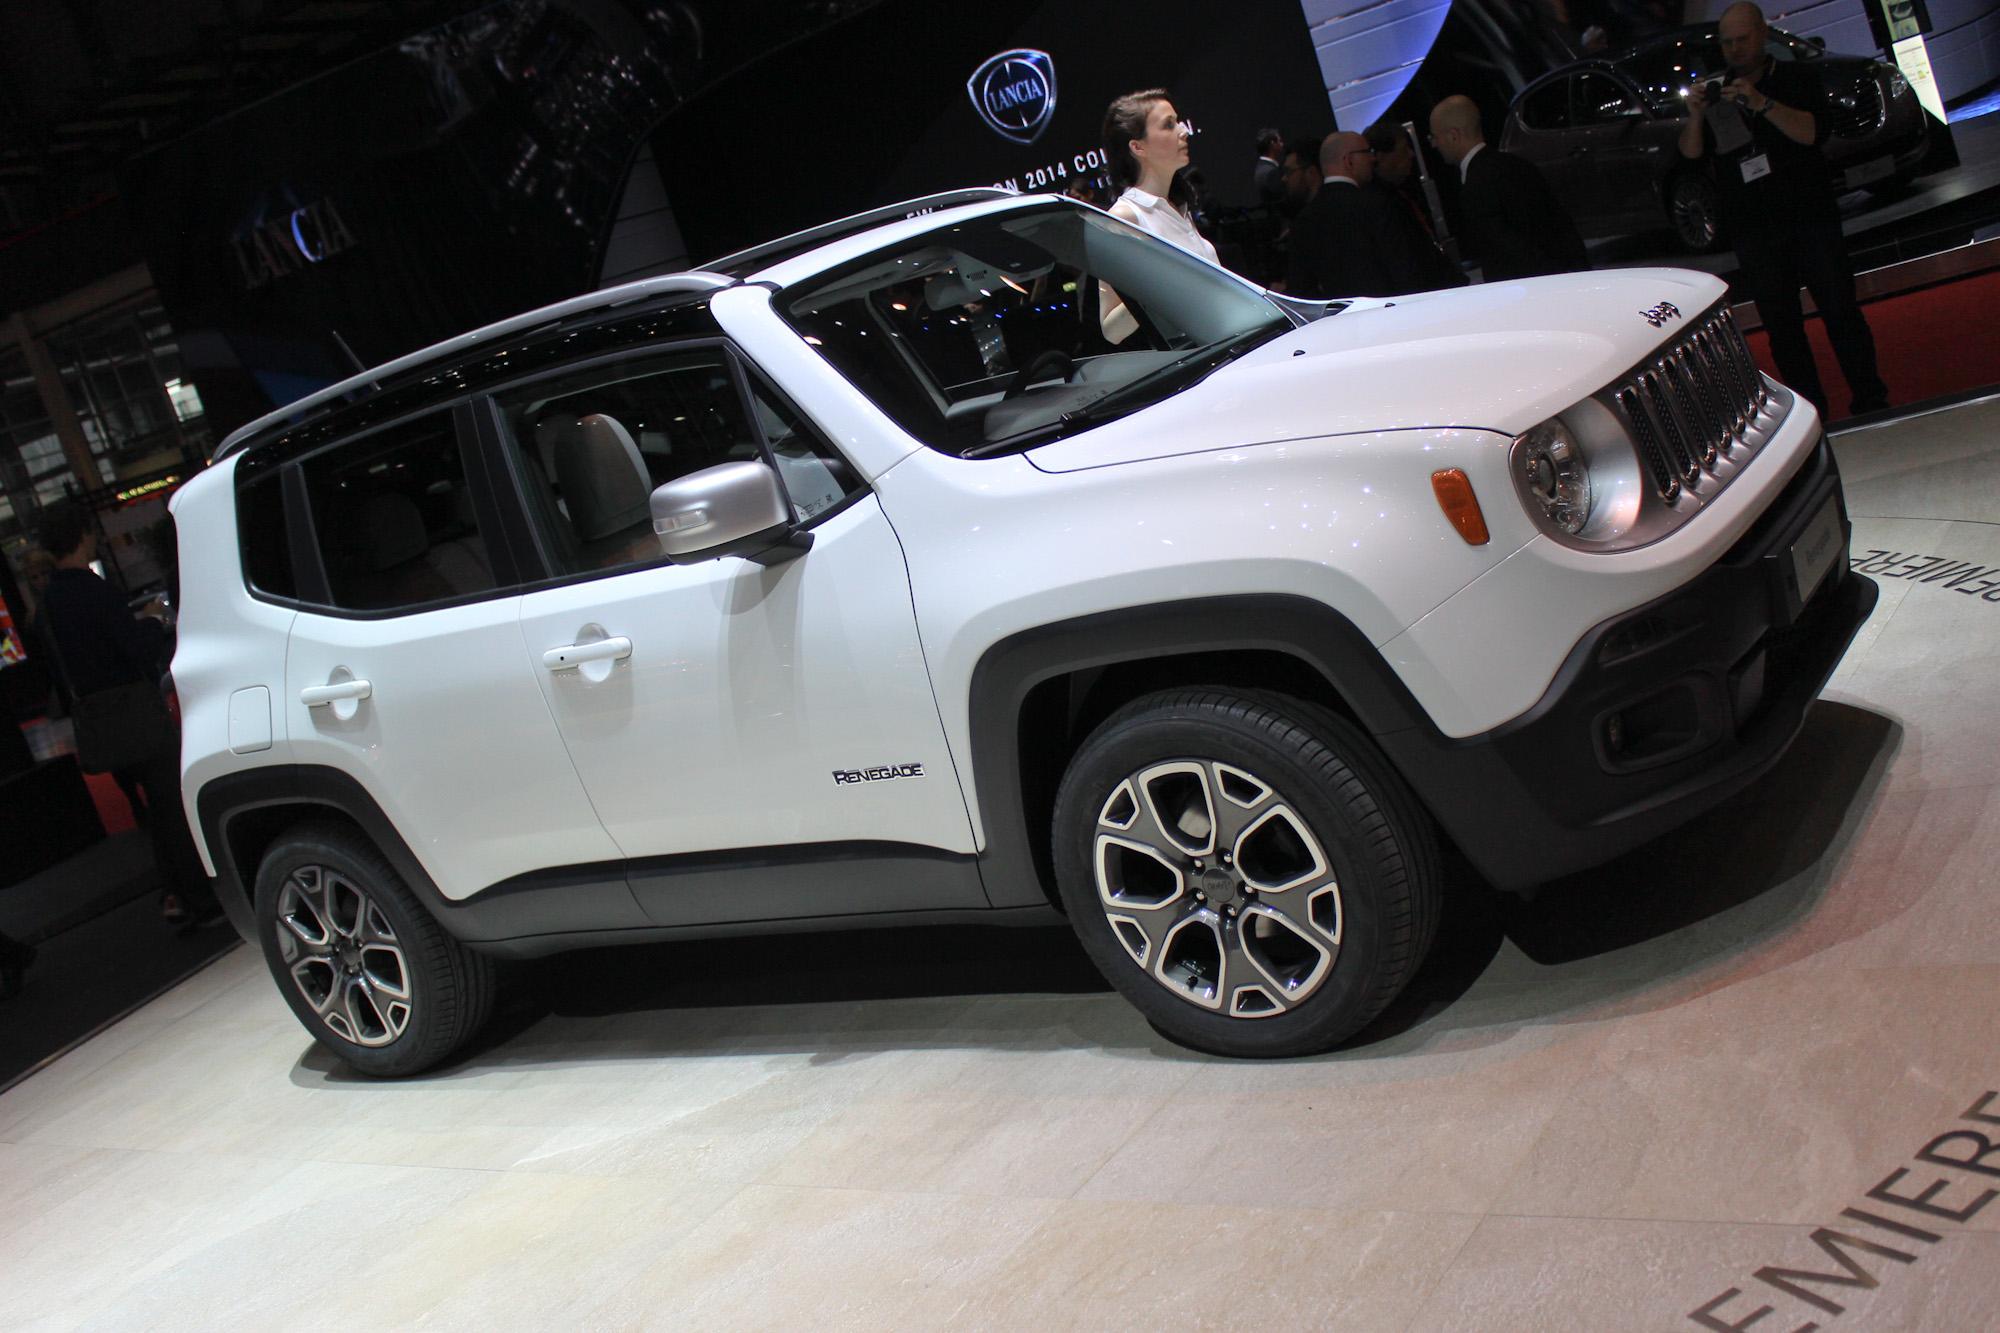 2015 Jeep Renegade Tiniest Jeep Yet Unveiled In Geneva